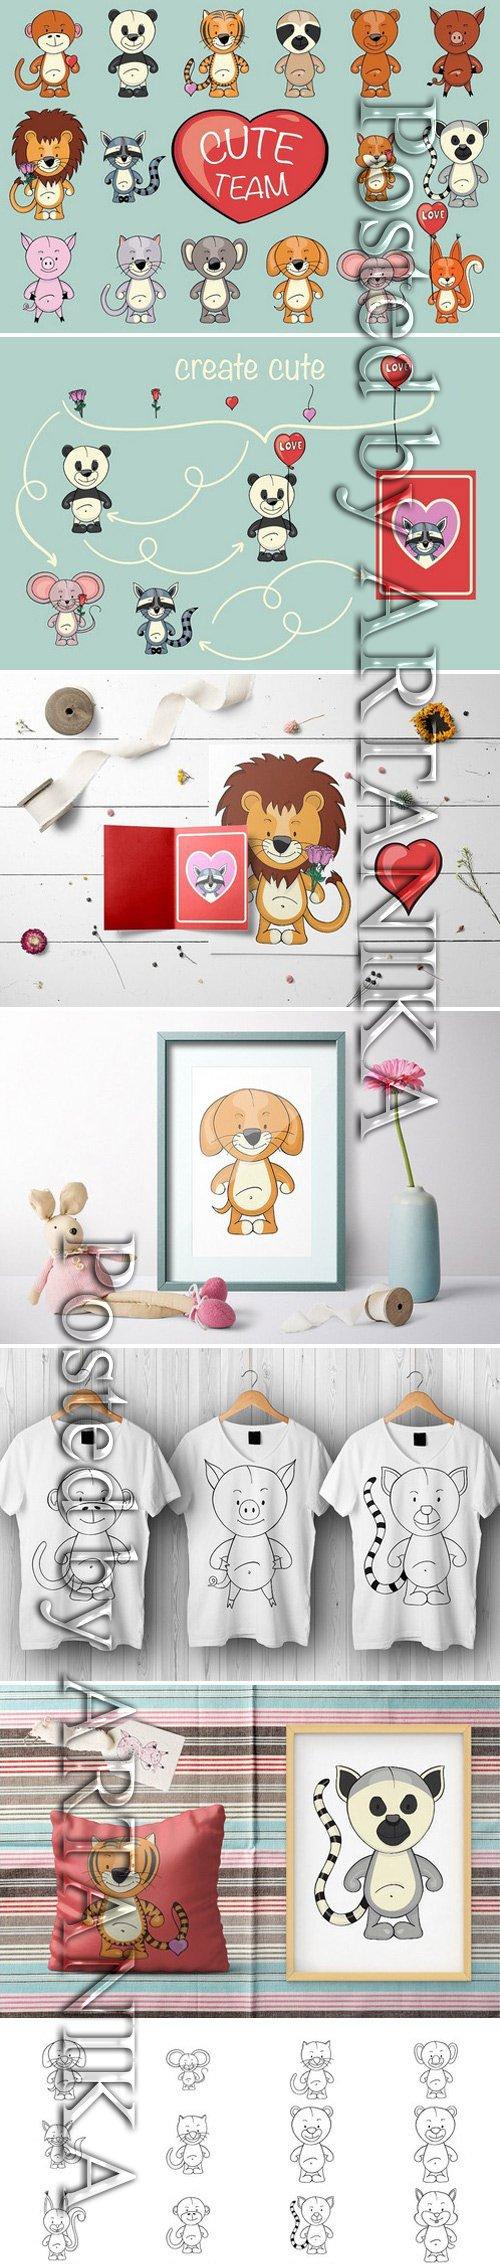 CM - Cute Team | Animals clipart creator 2166799